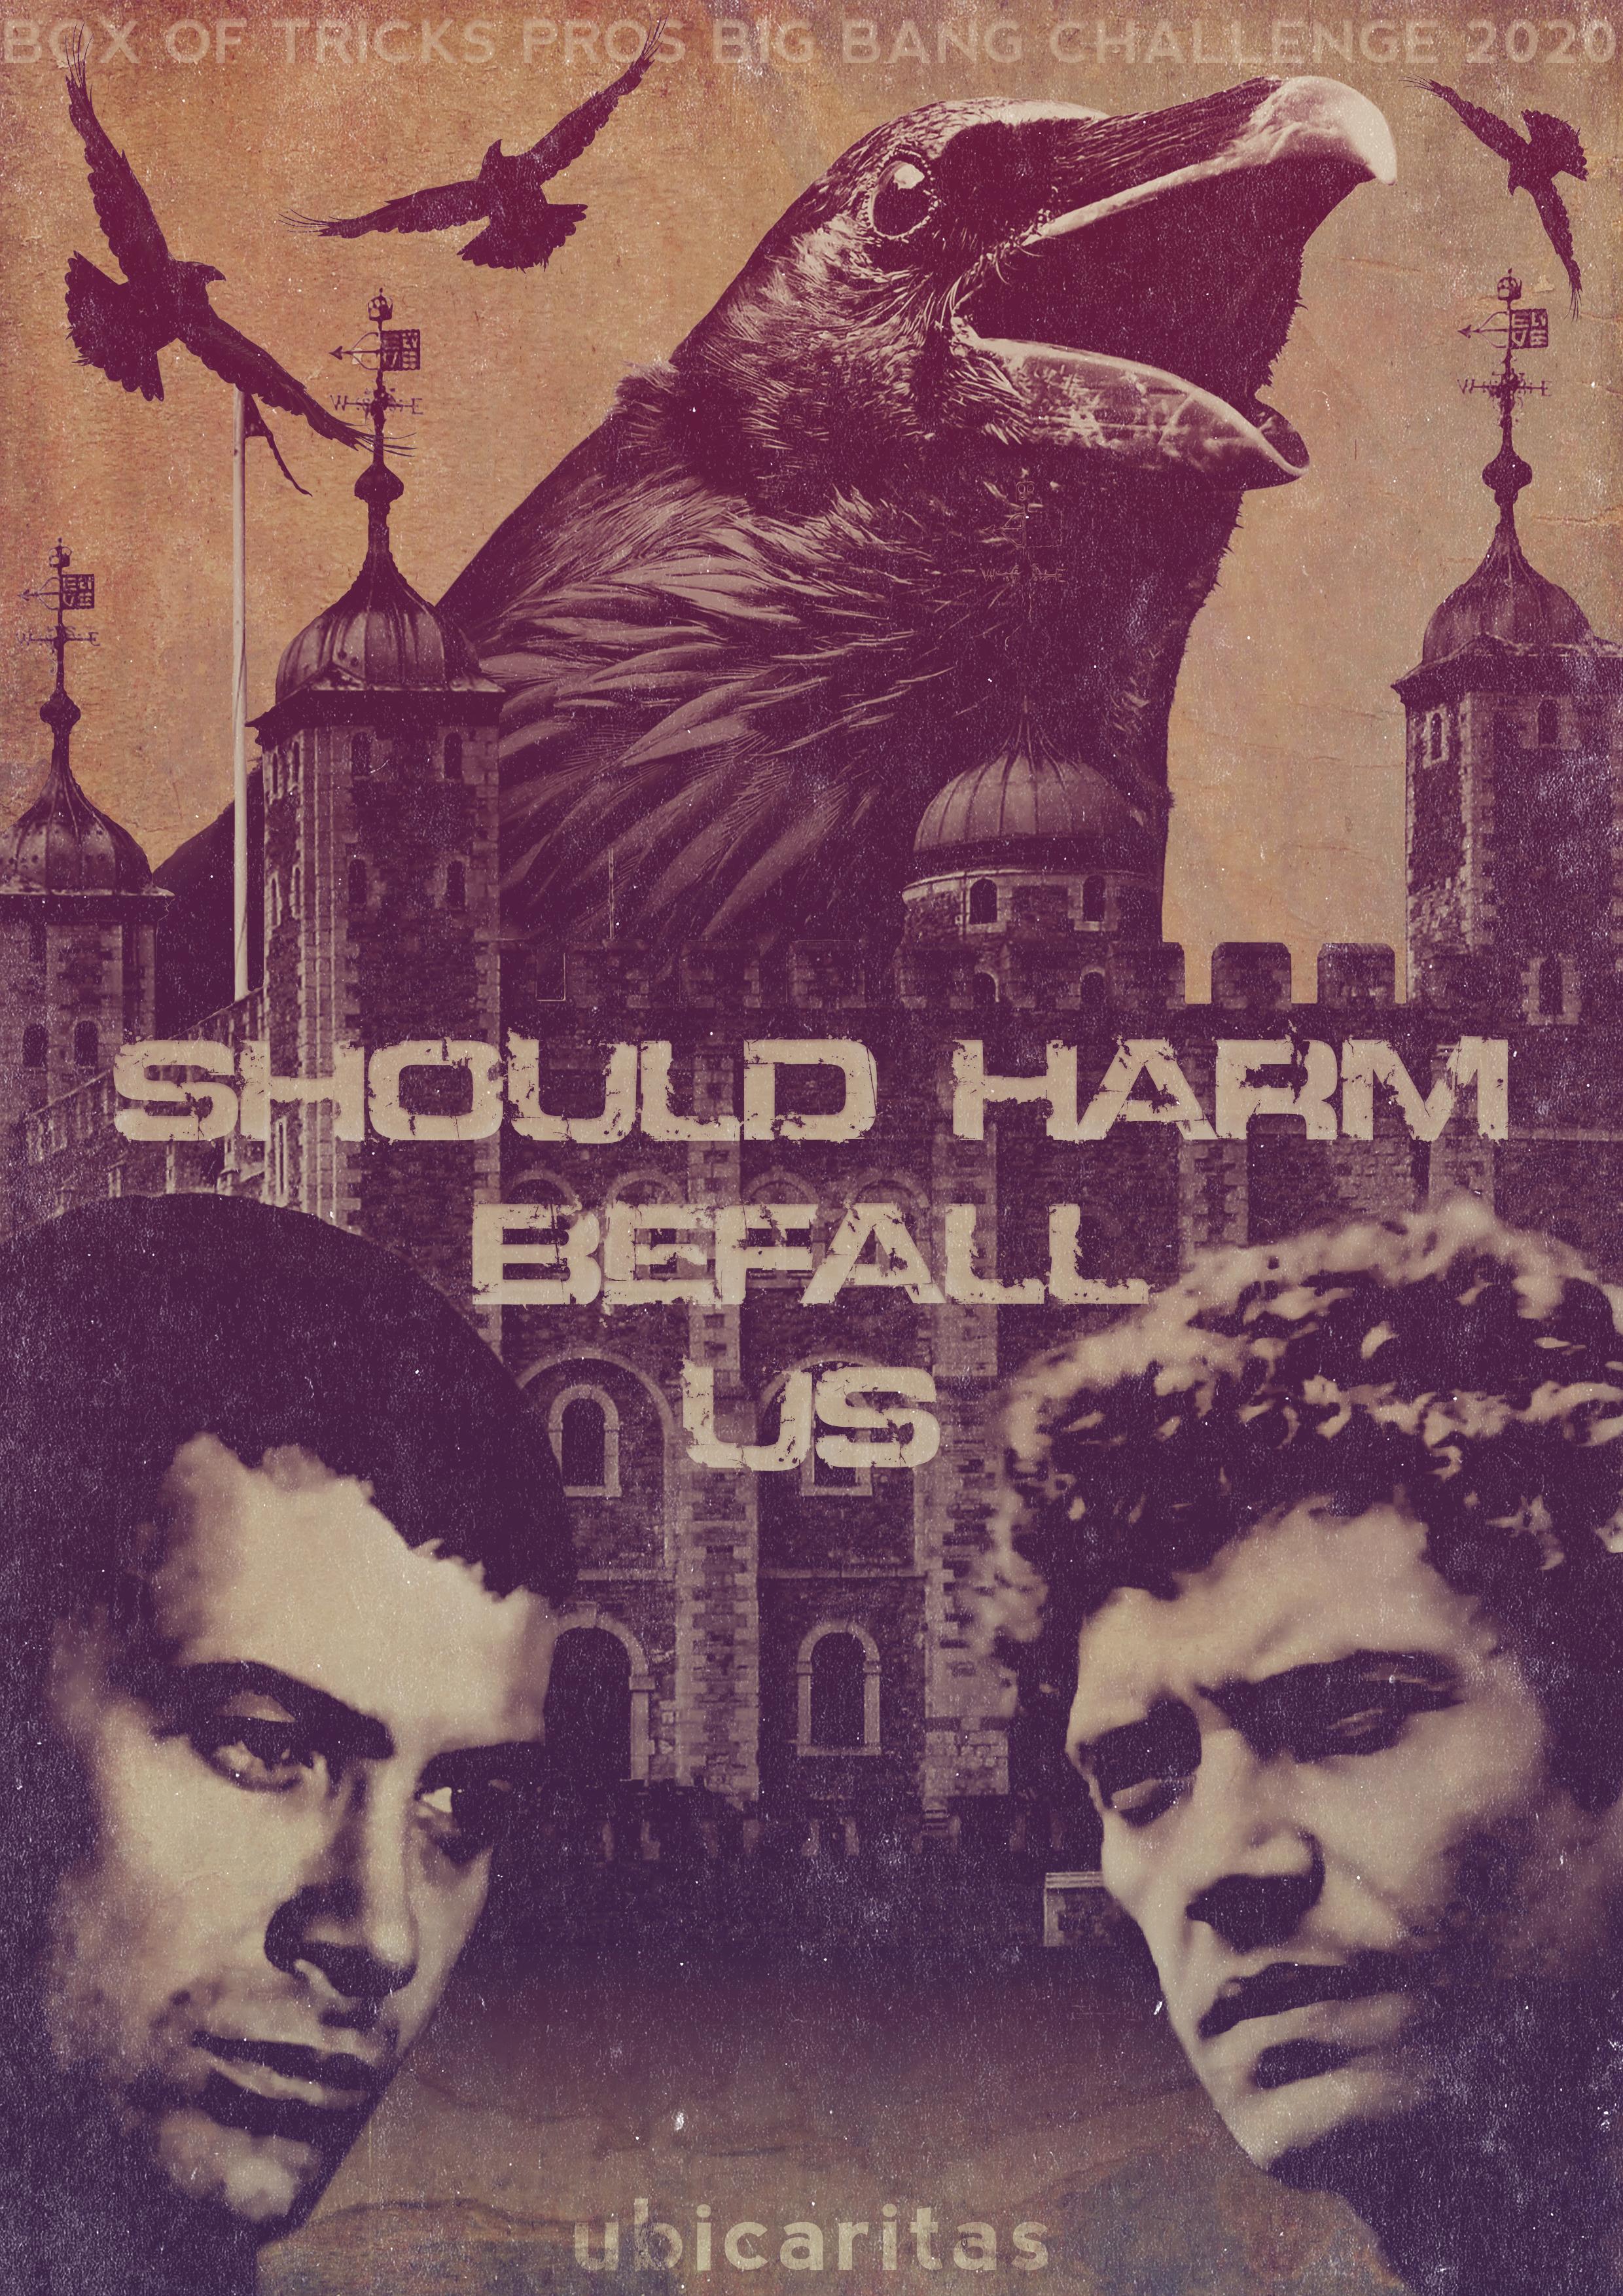 Ebook cover Should Harm Befall Us by ubicaritas